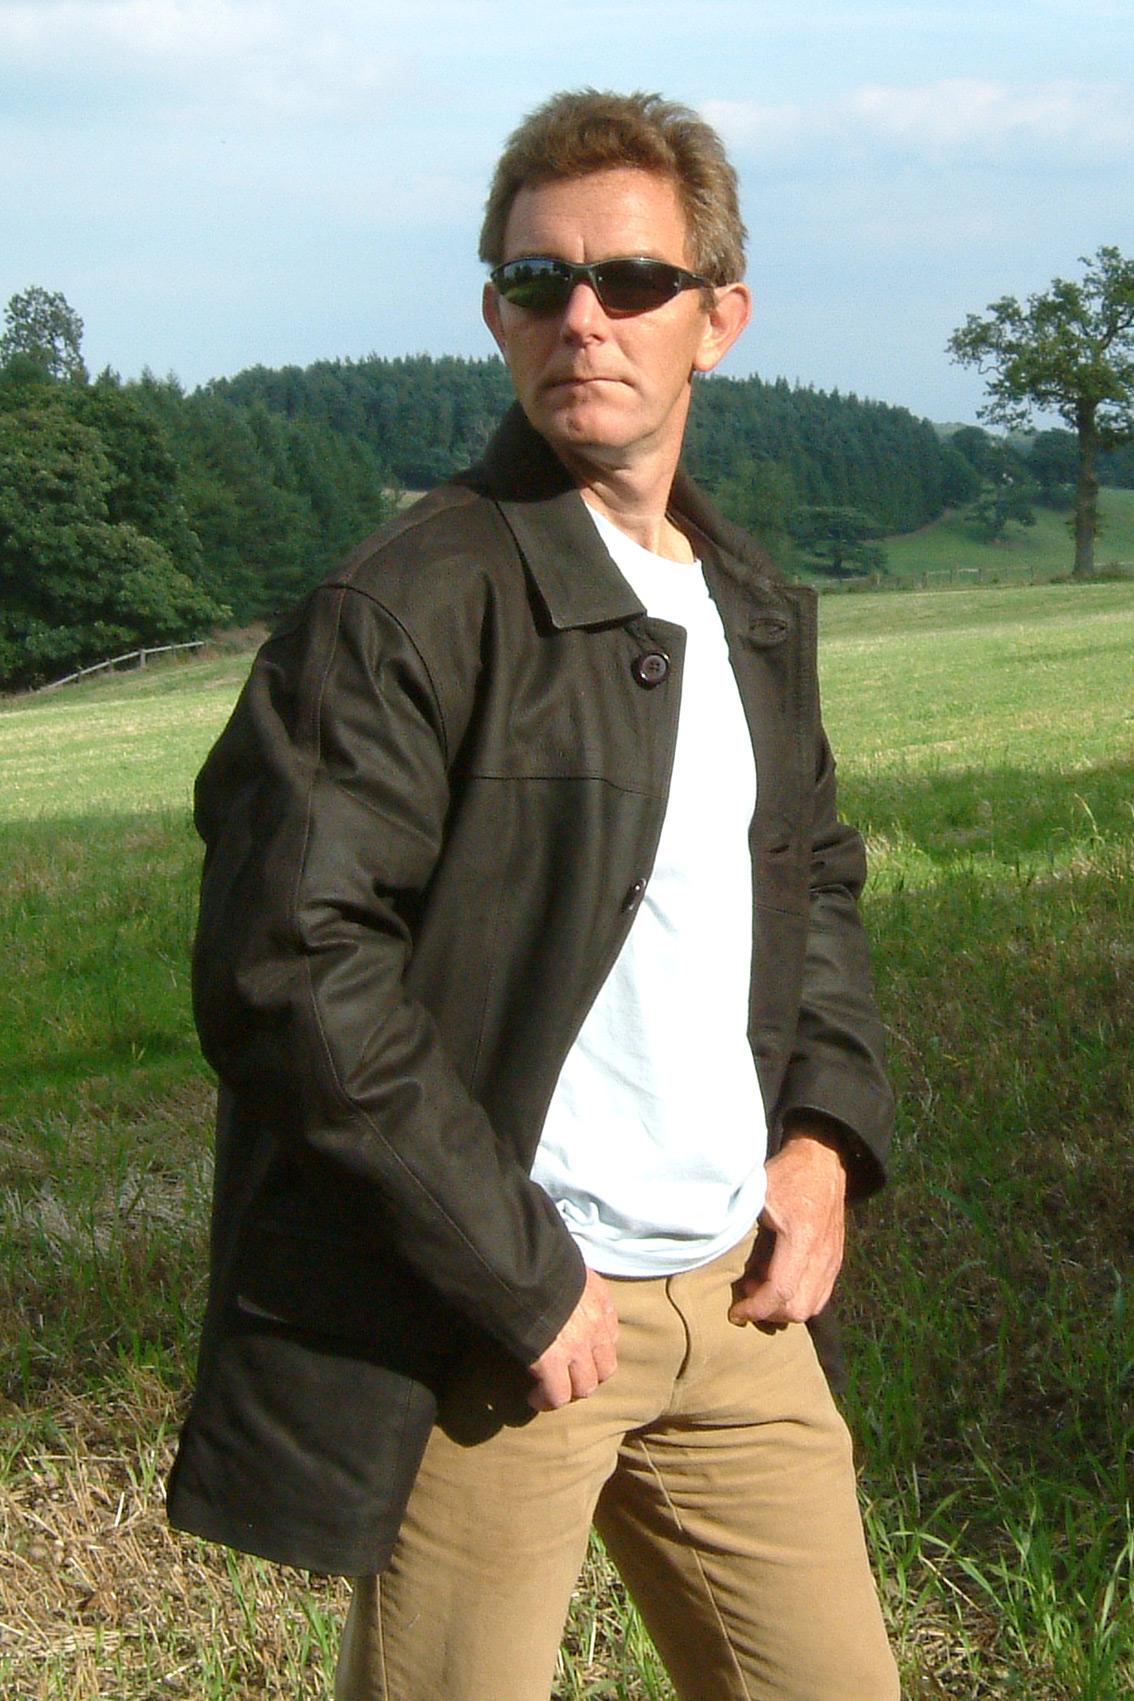 Black Leather Biker Jacket For Men Wallpaper Hd